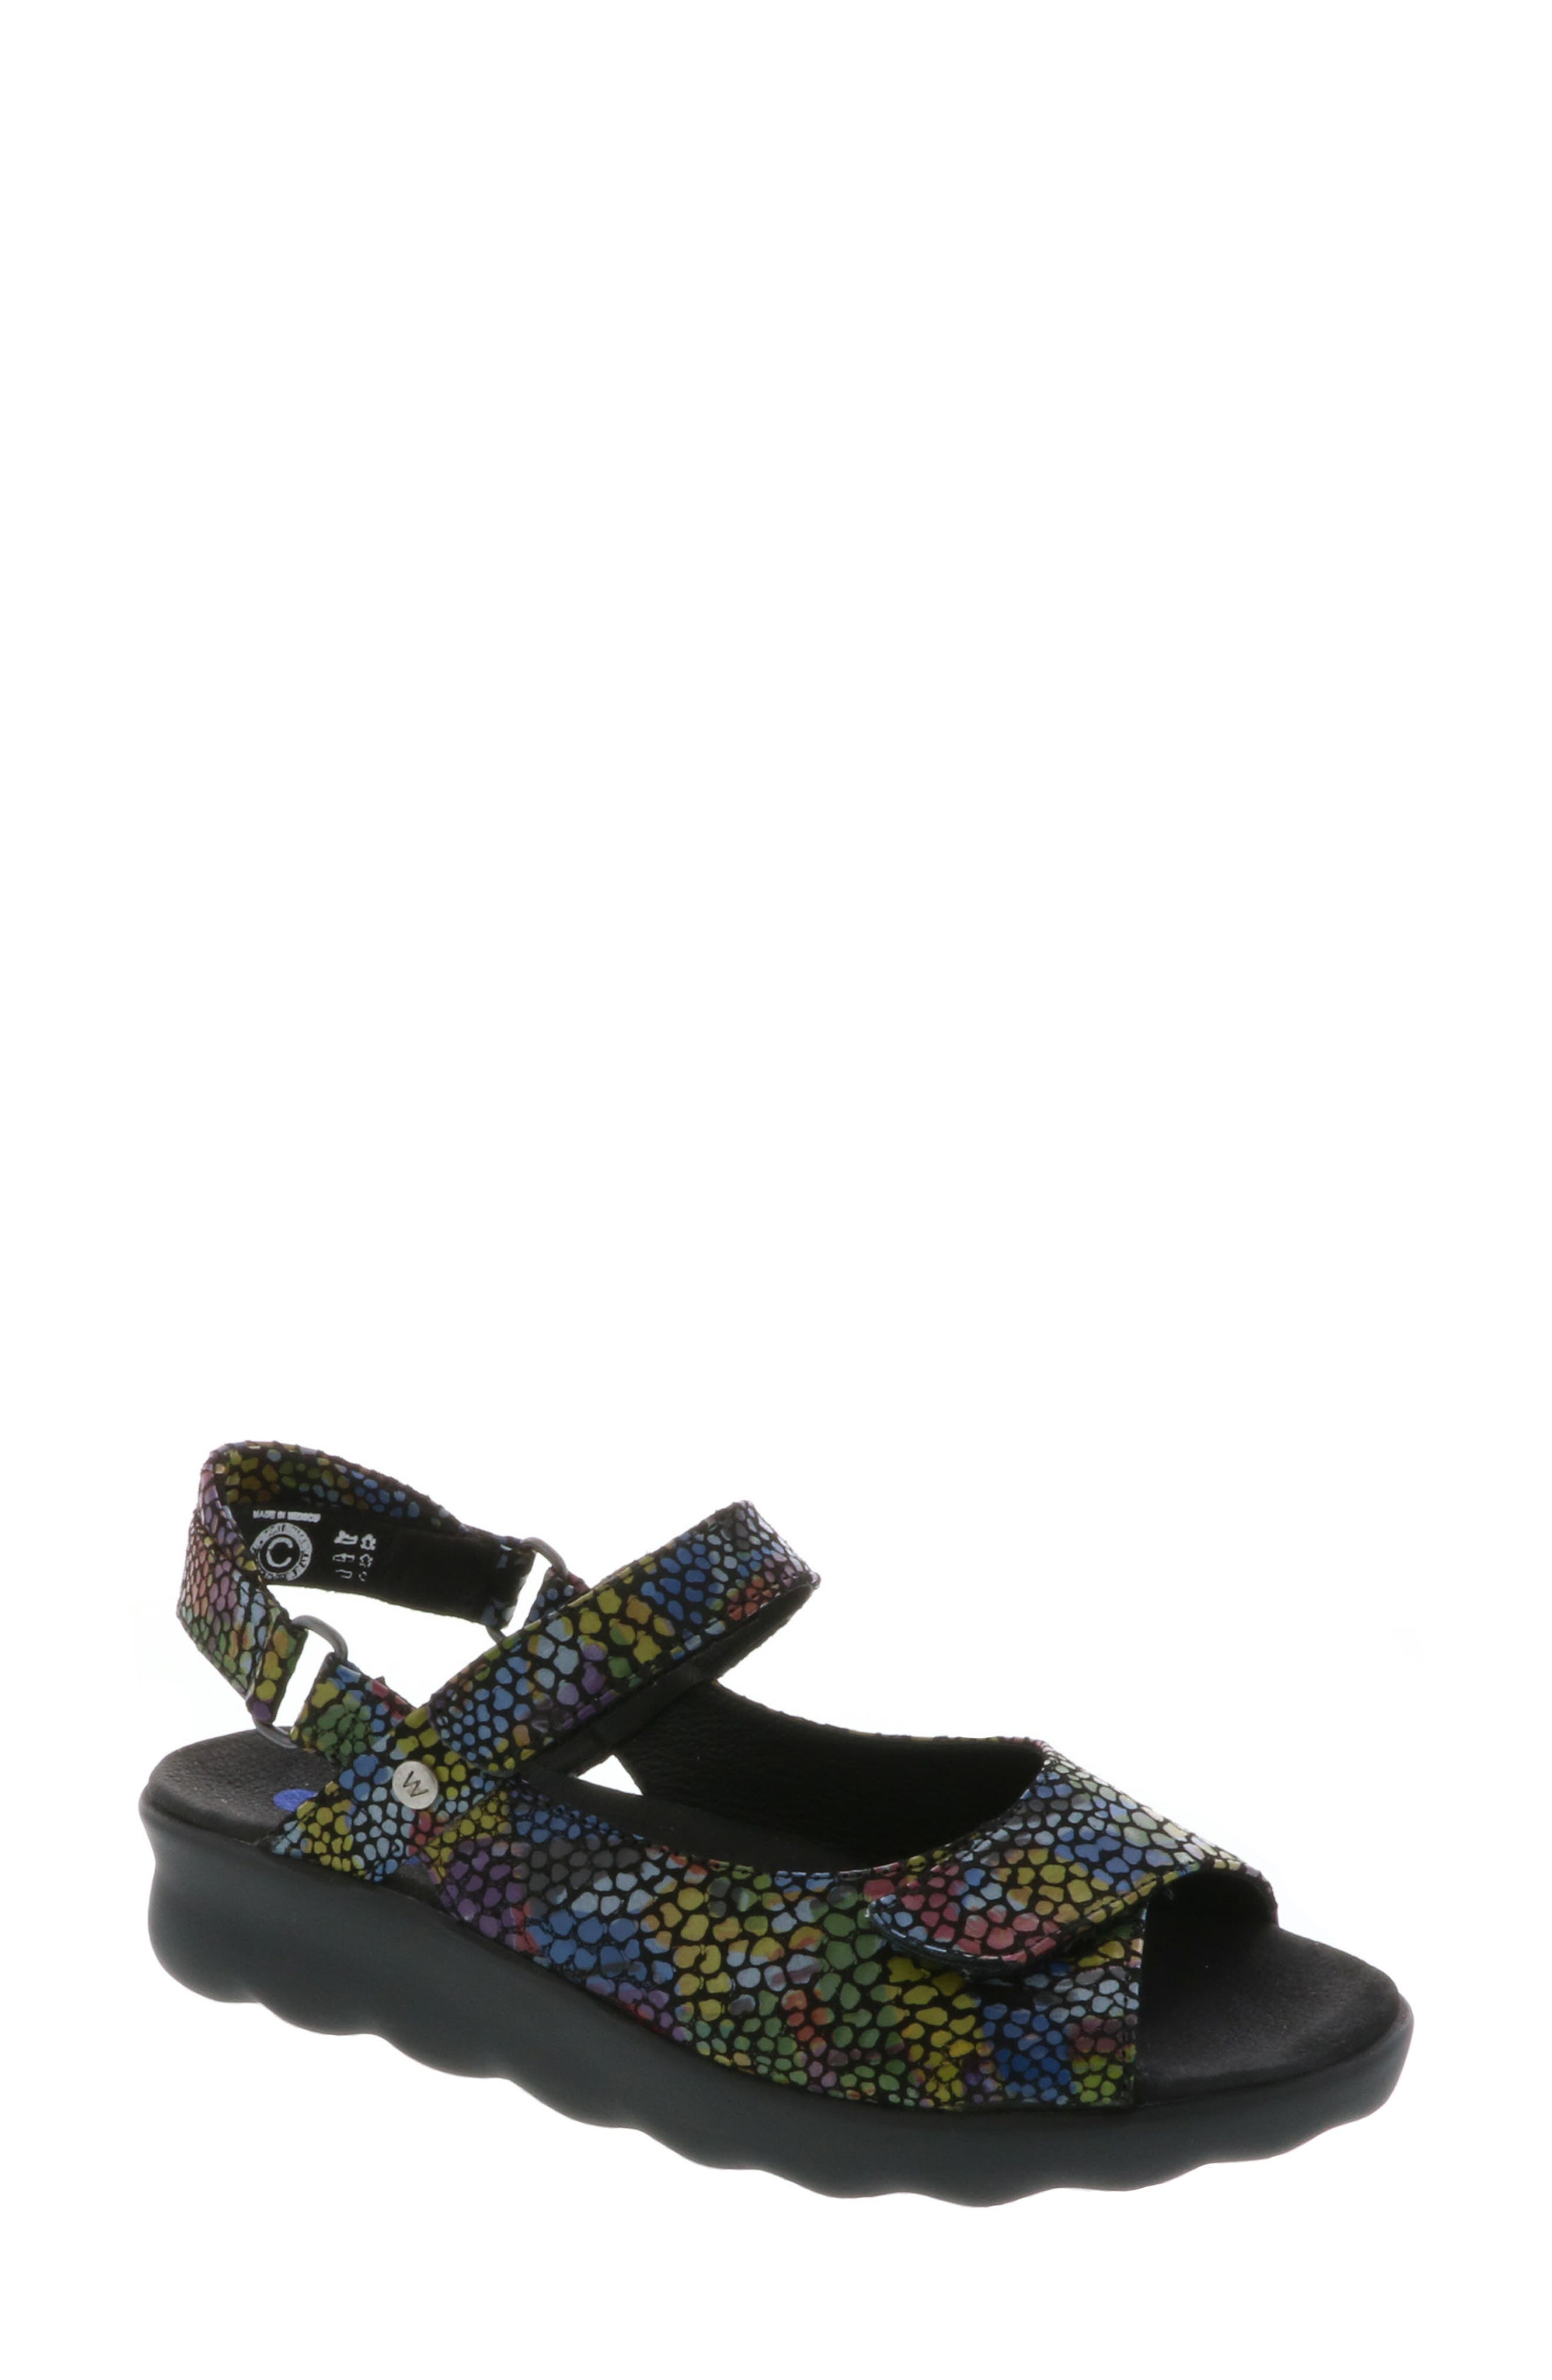 Pichu Quarter Strap Sandal,                             Main thumbnail 1, color,                             Black Multi Color Fantasy